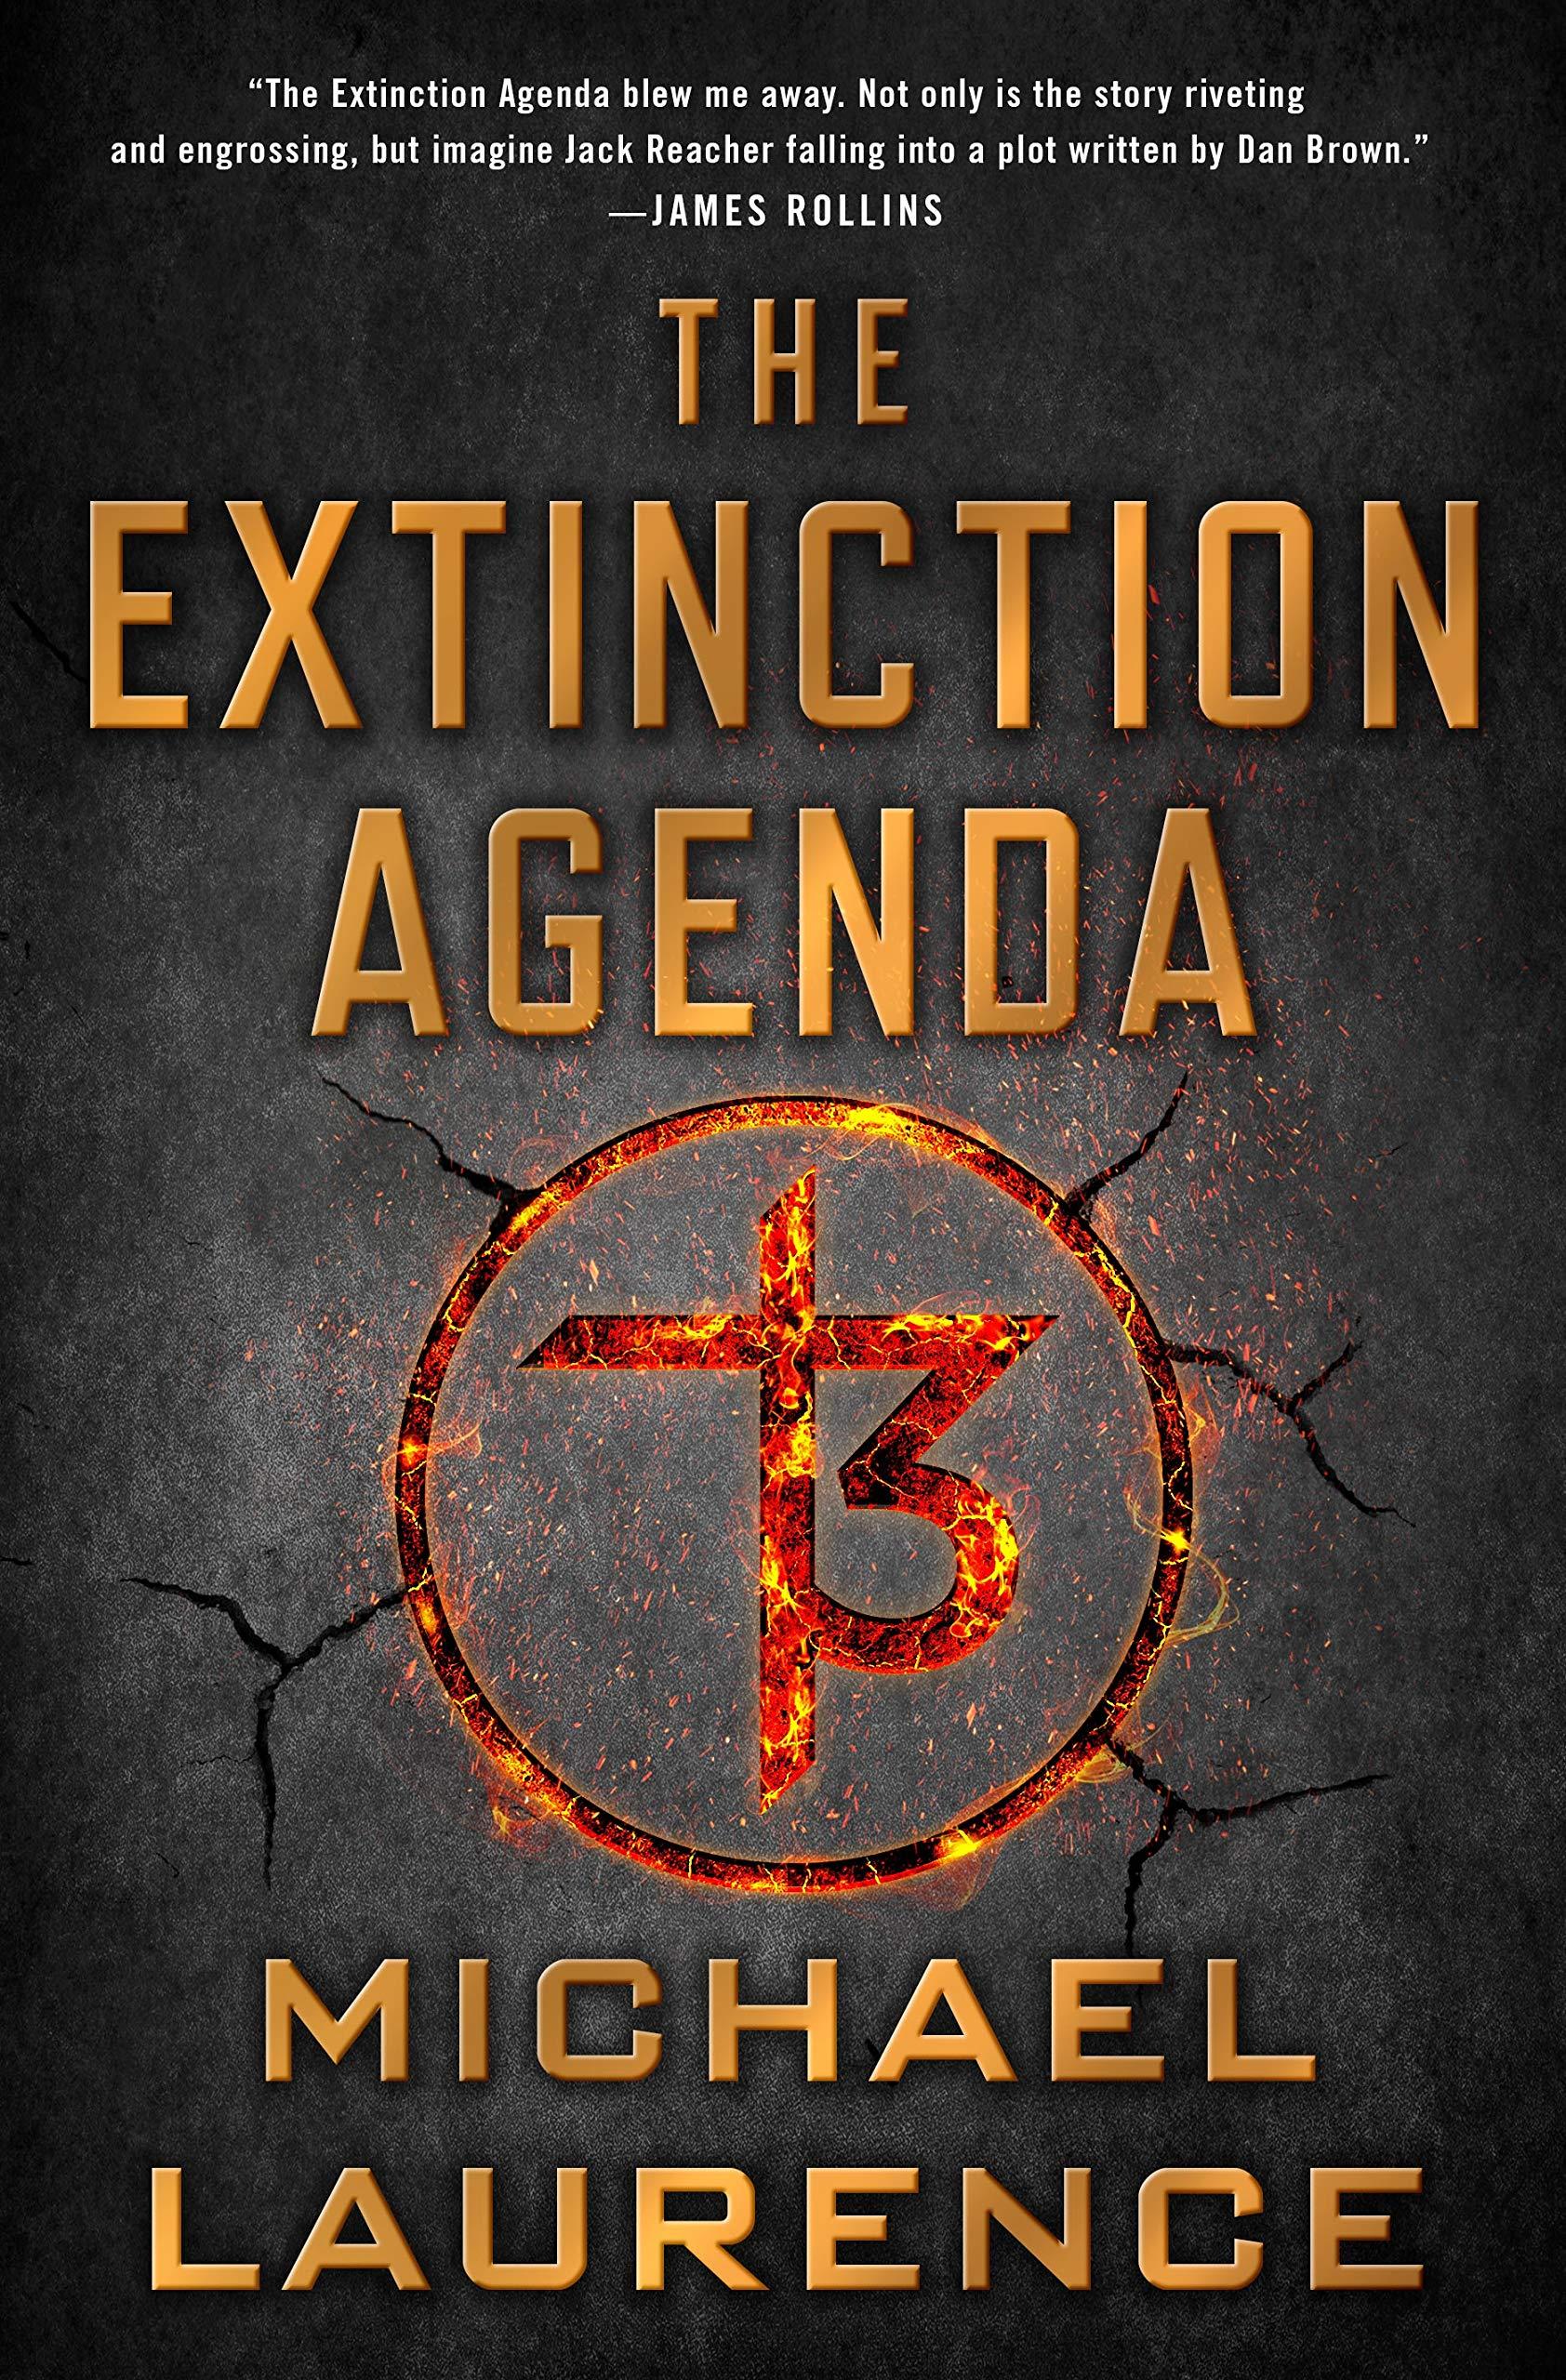 Amazon.com: The Extinction Agenda (9781250158482): Michael ...